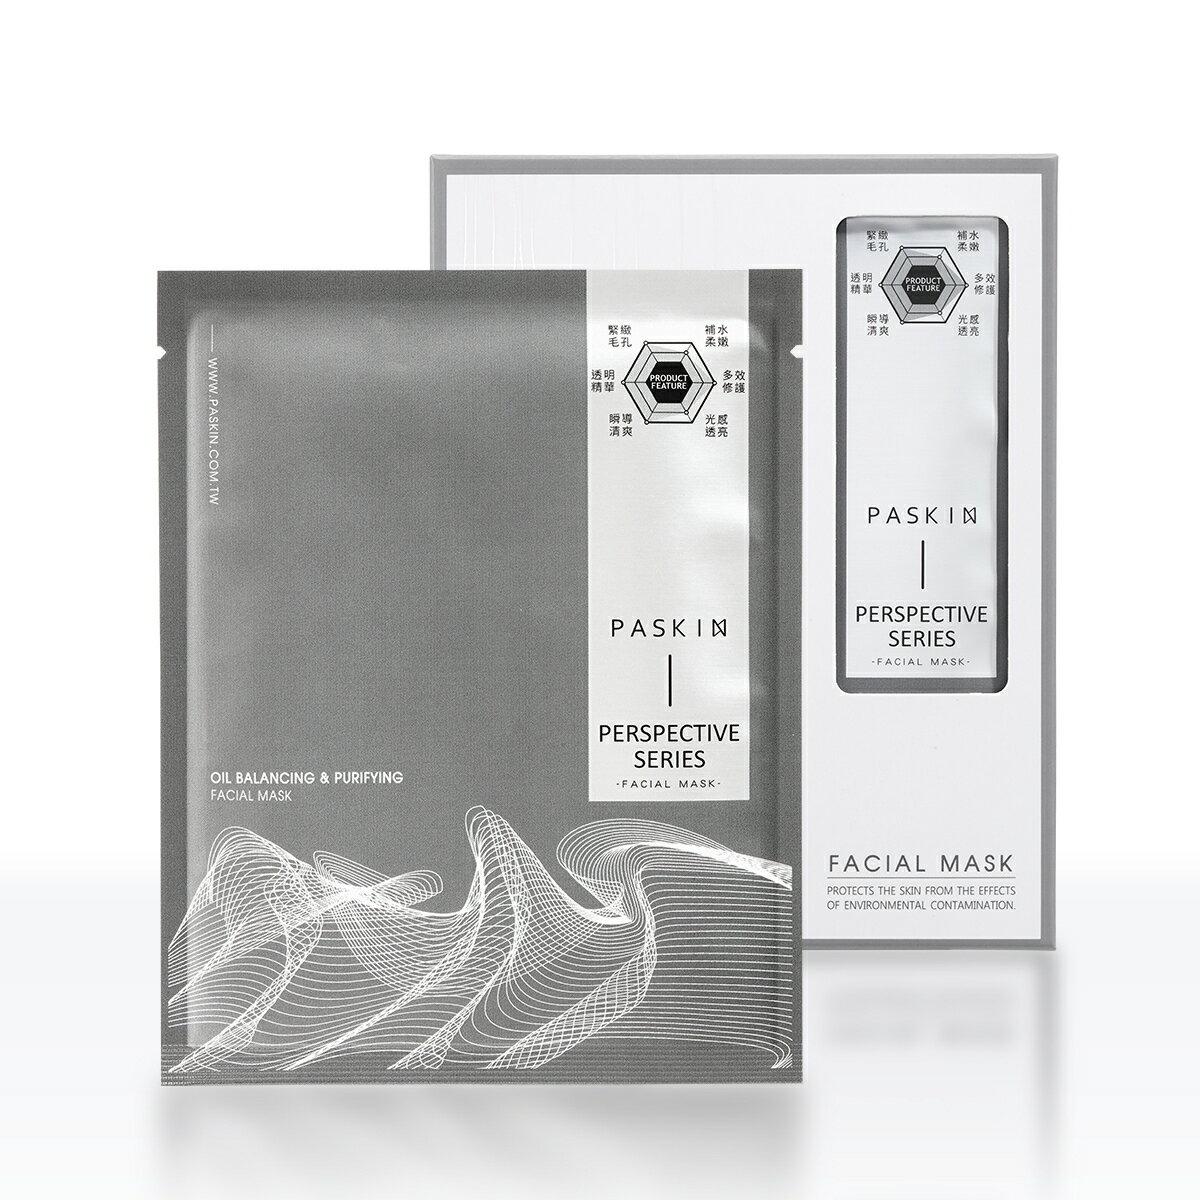 PASKIN面膜 毛孔管理 純淨平衡面膜,6片/盒